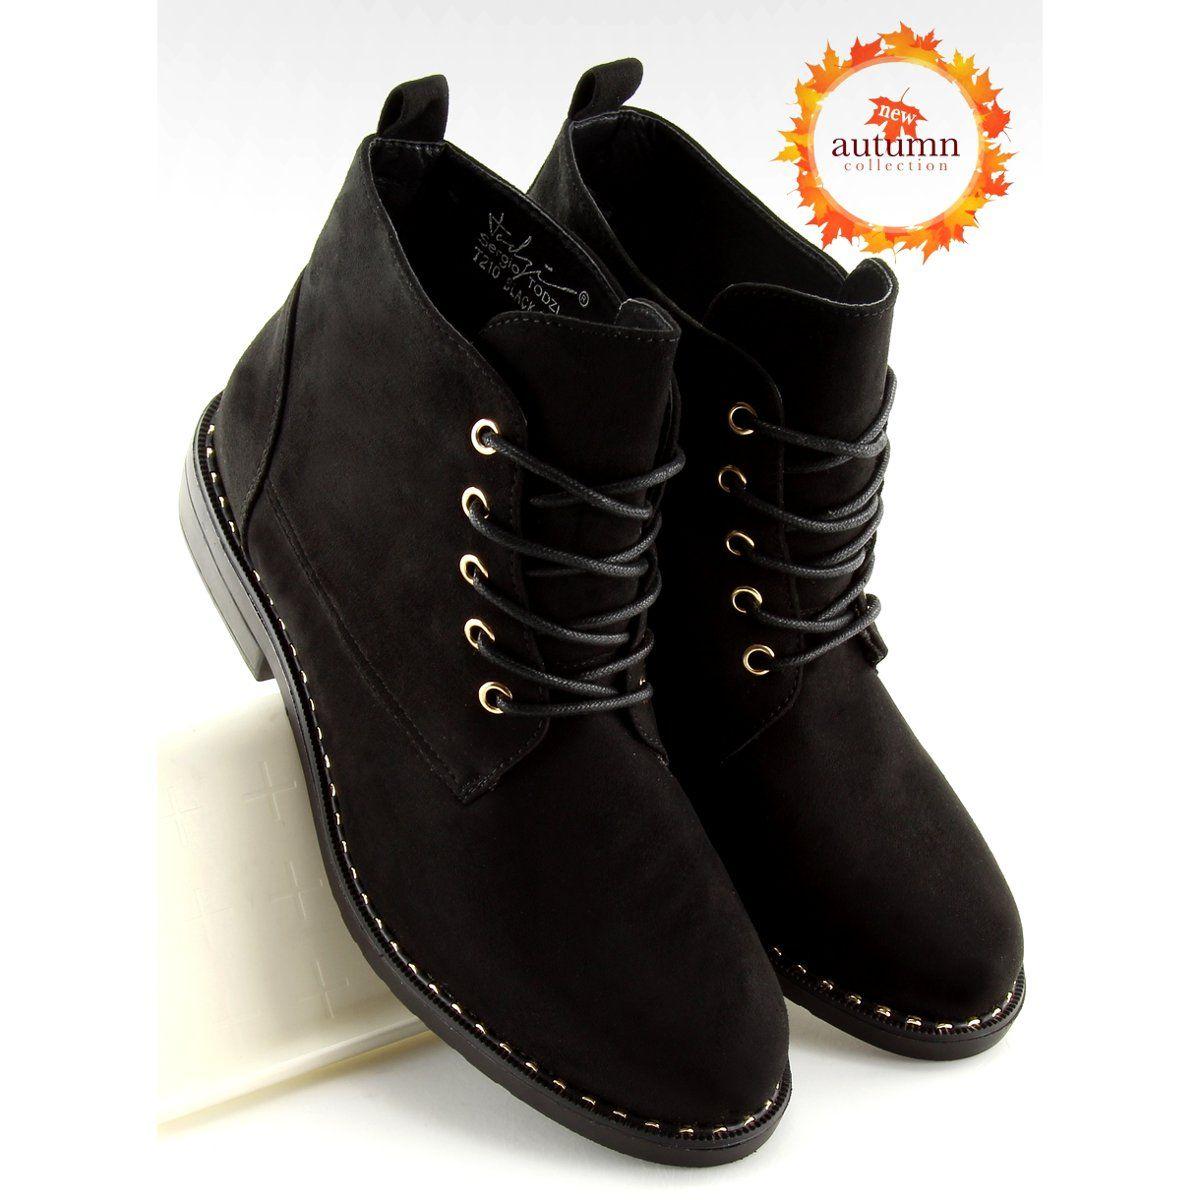 Polbuty Sznurowane Czarne T210 Black Shoes Womens Boots Flat Boot Shoes Women